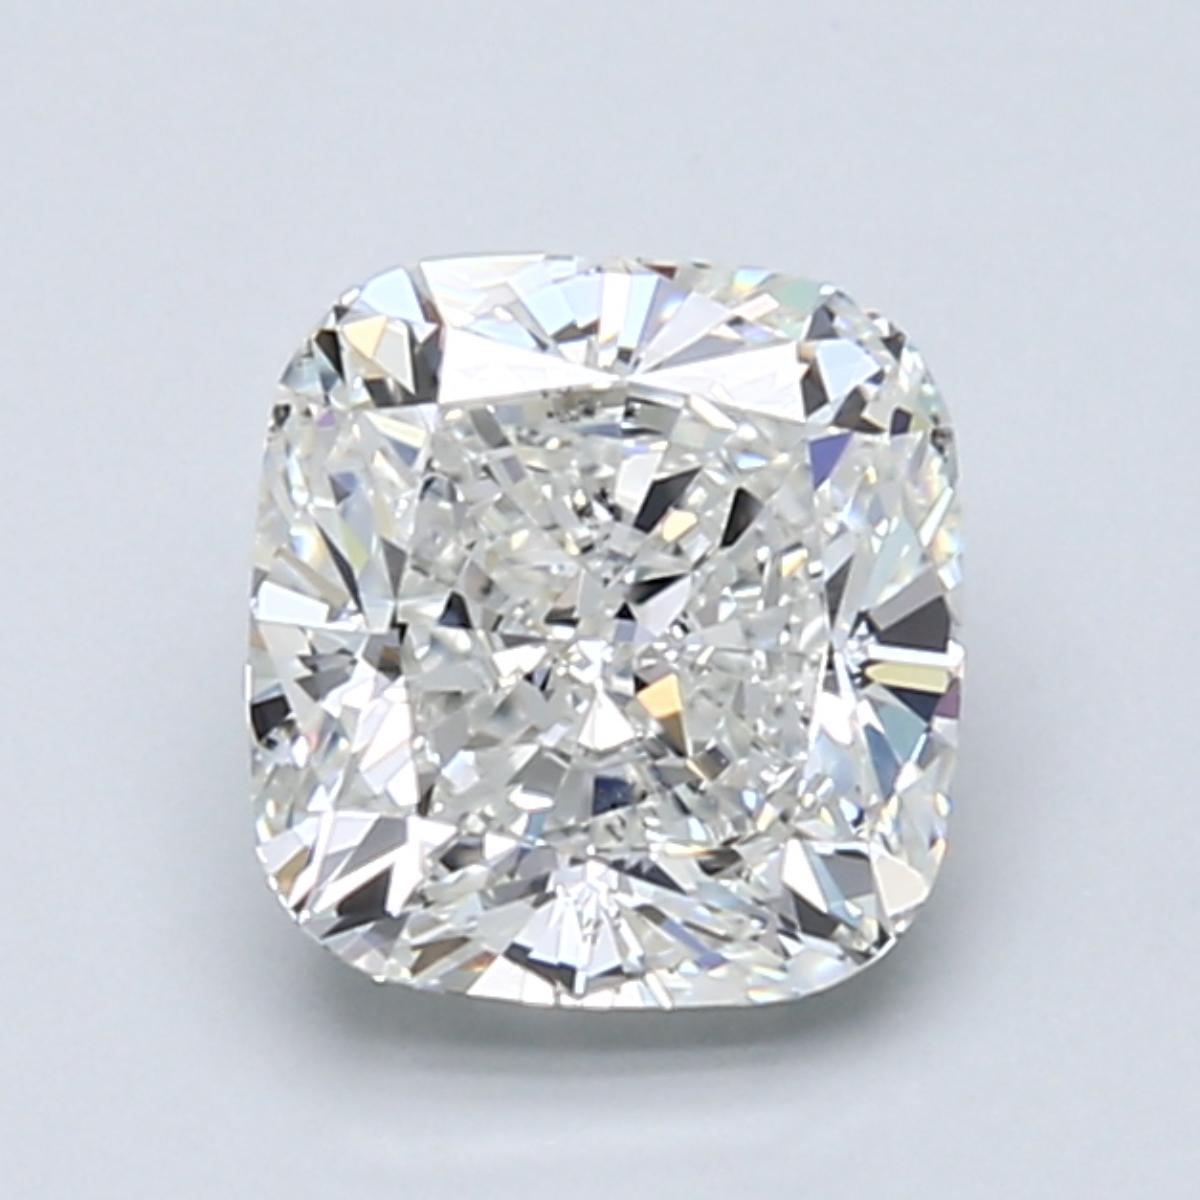 1.71 carat Cushion Diamond, Very Good cut, graded by the GIA laboratories.